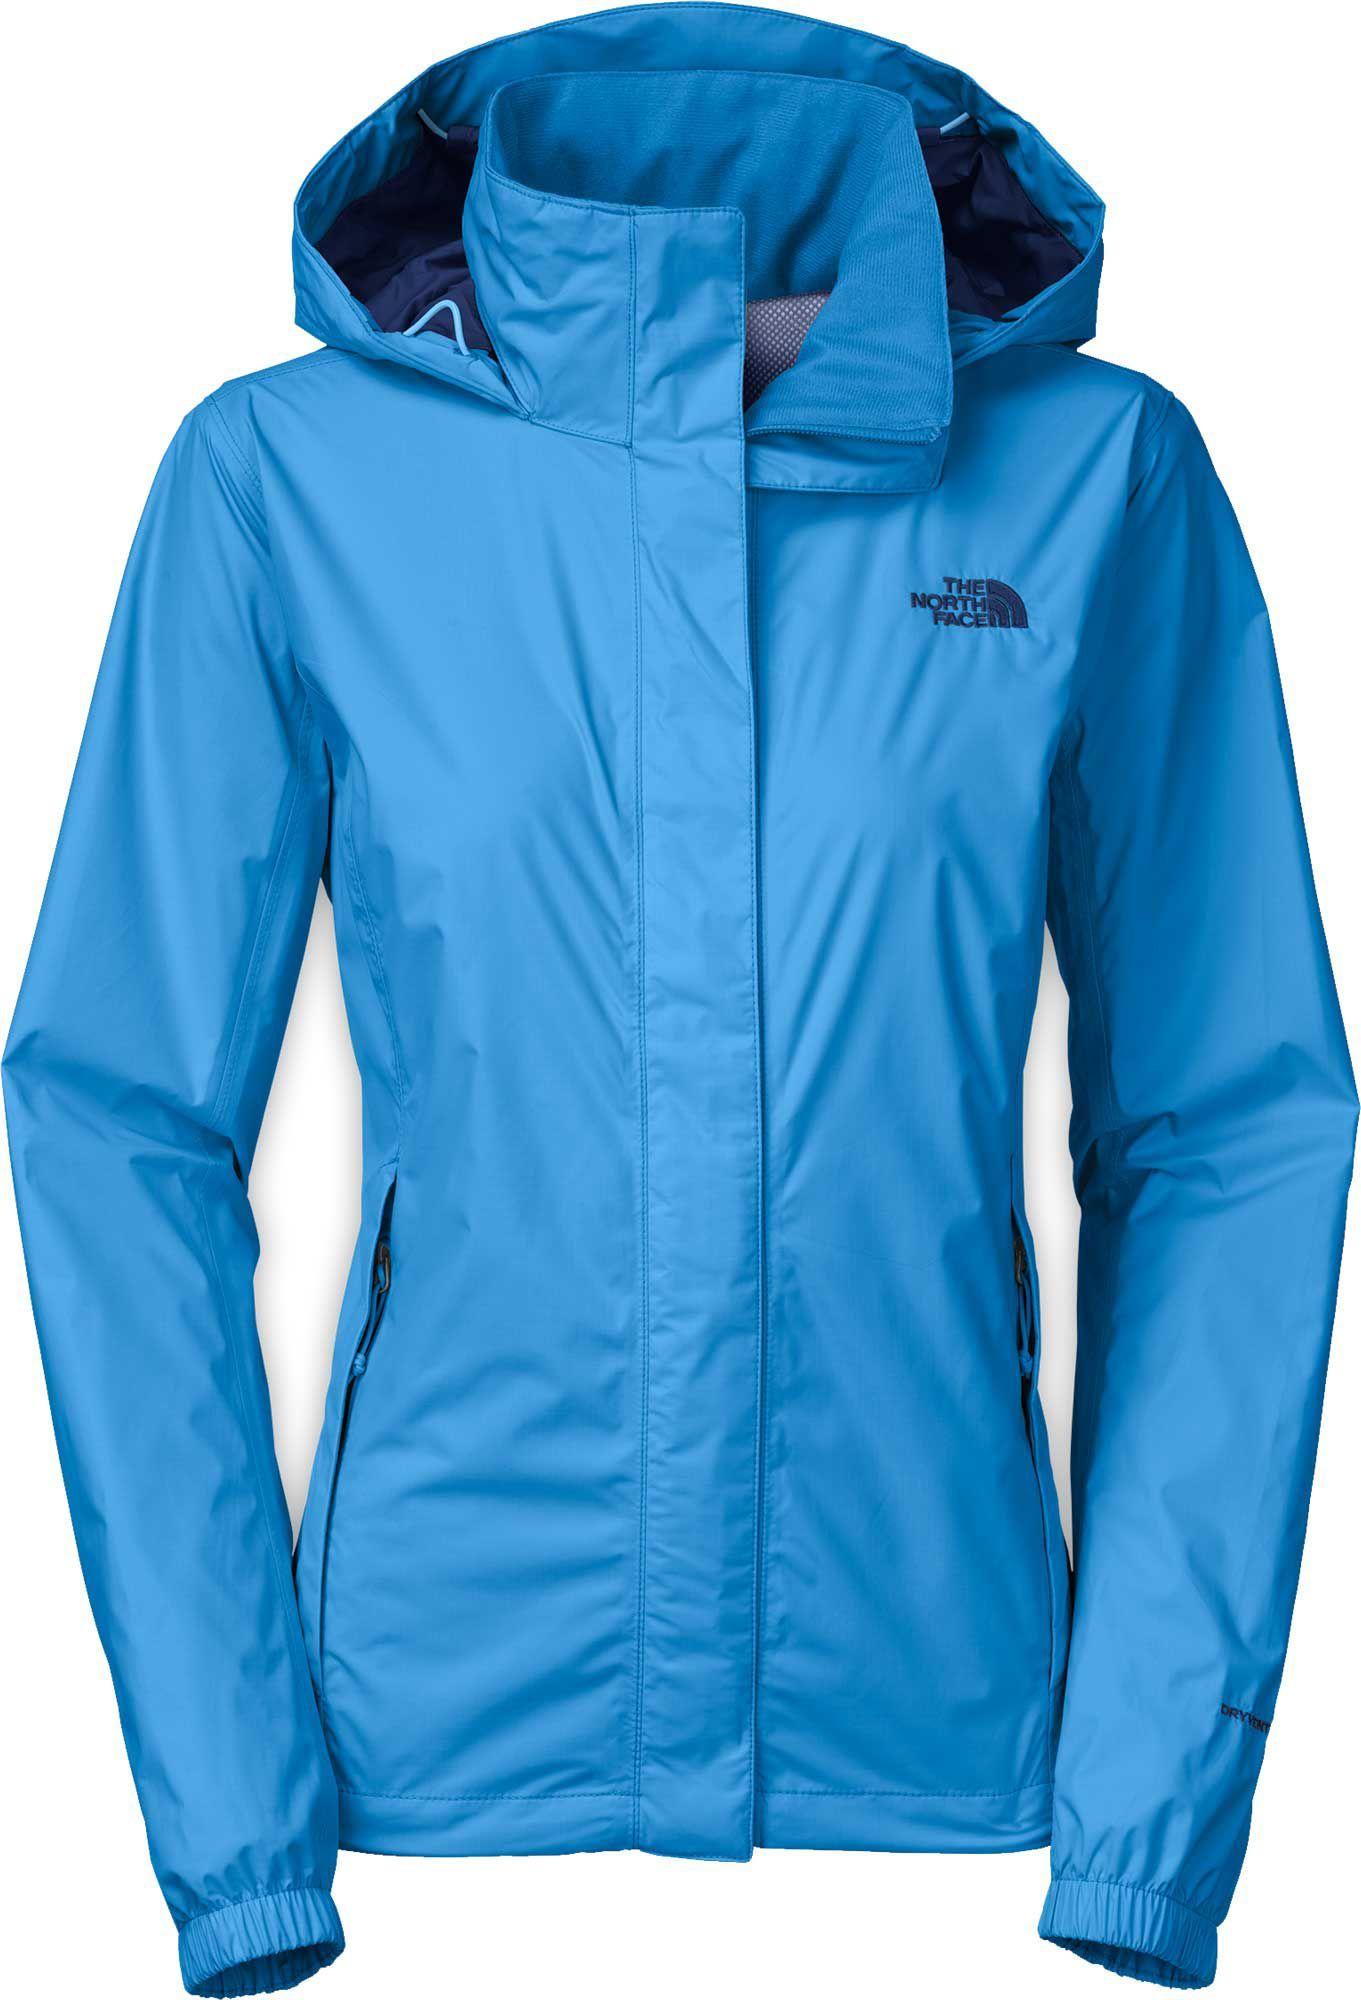 e1a7a4047 The North Face Women's Resolve Rain Jacket | Products | Rain jacket ...